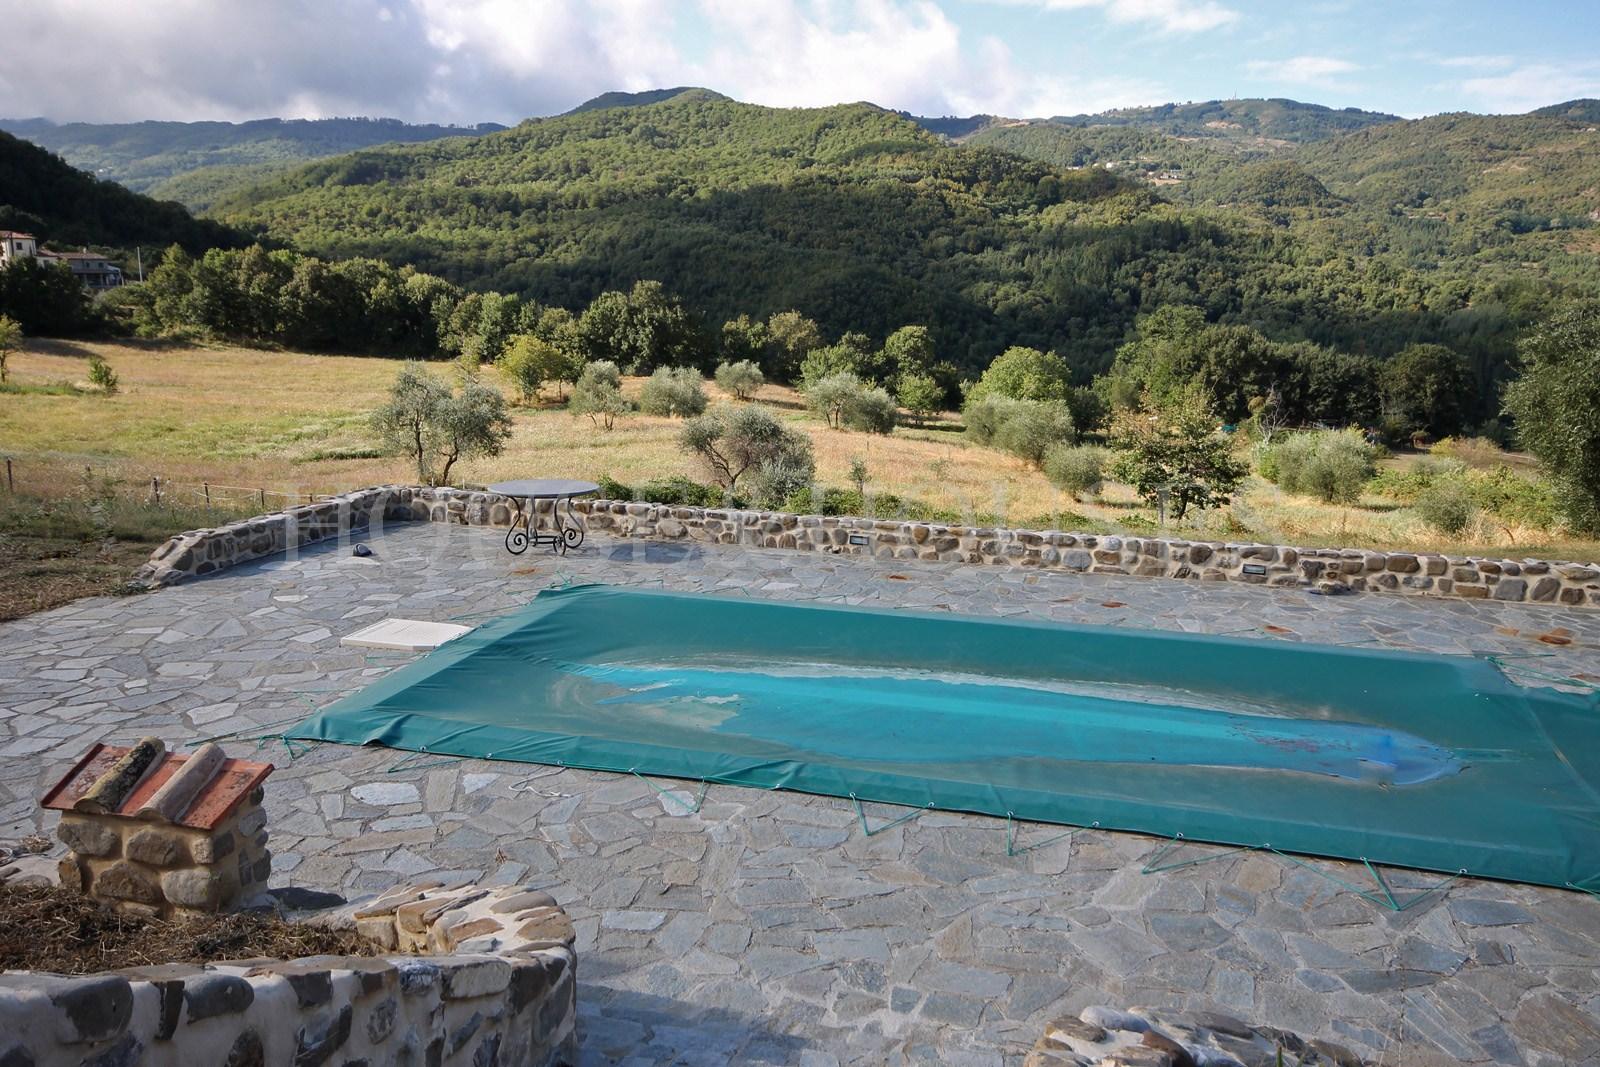 Toscana grosseto arcidosso villa con piscina in vendita - B b toscana con piscina ...